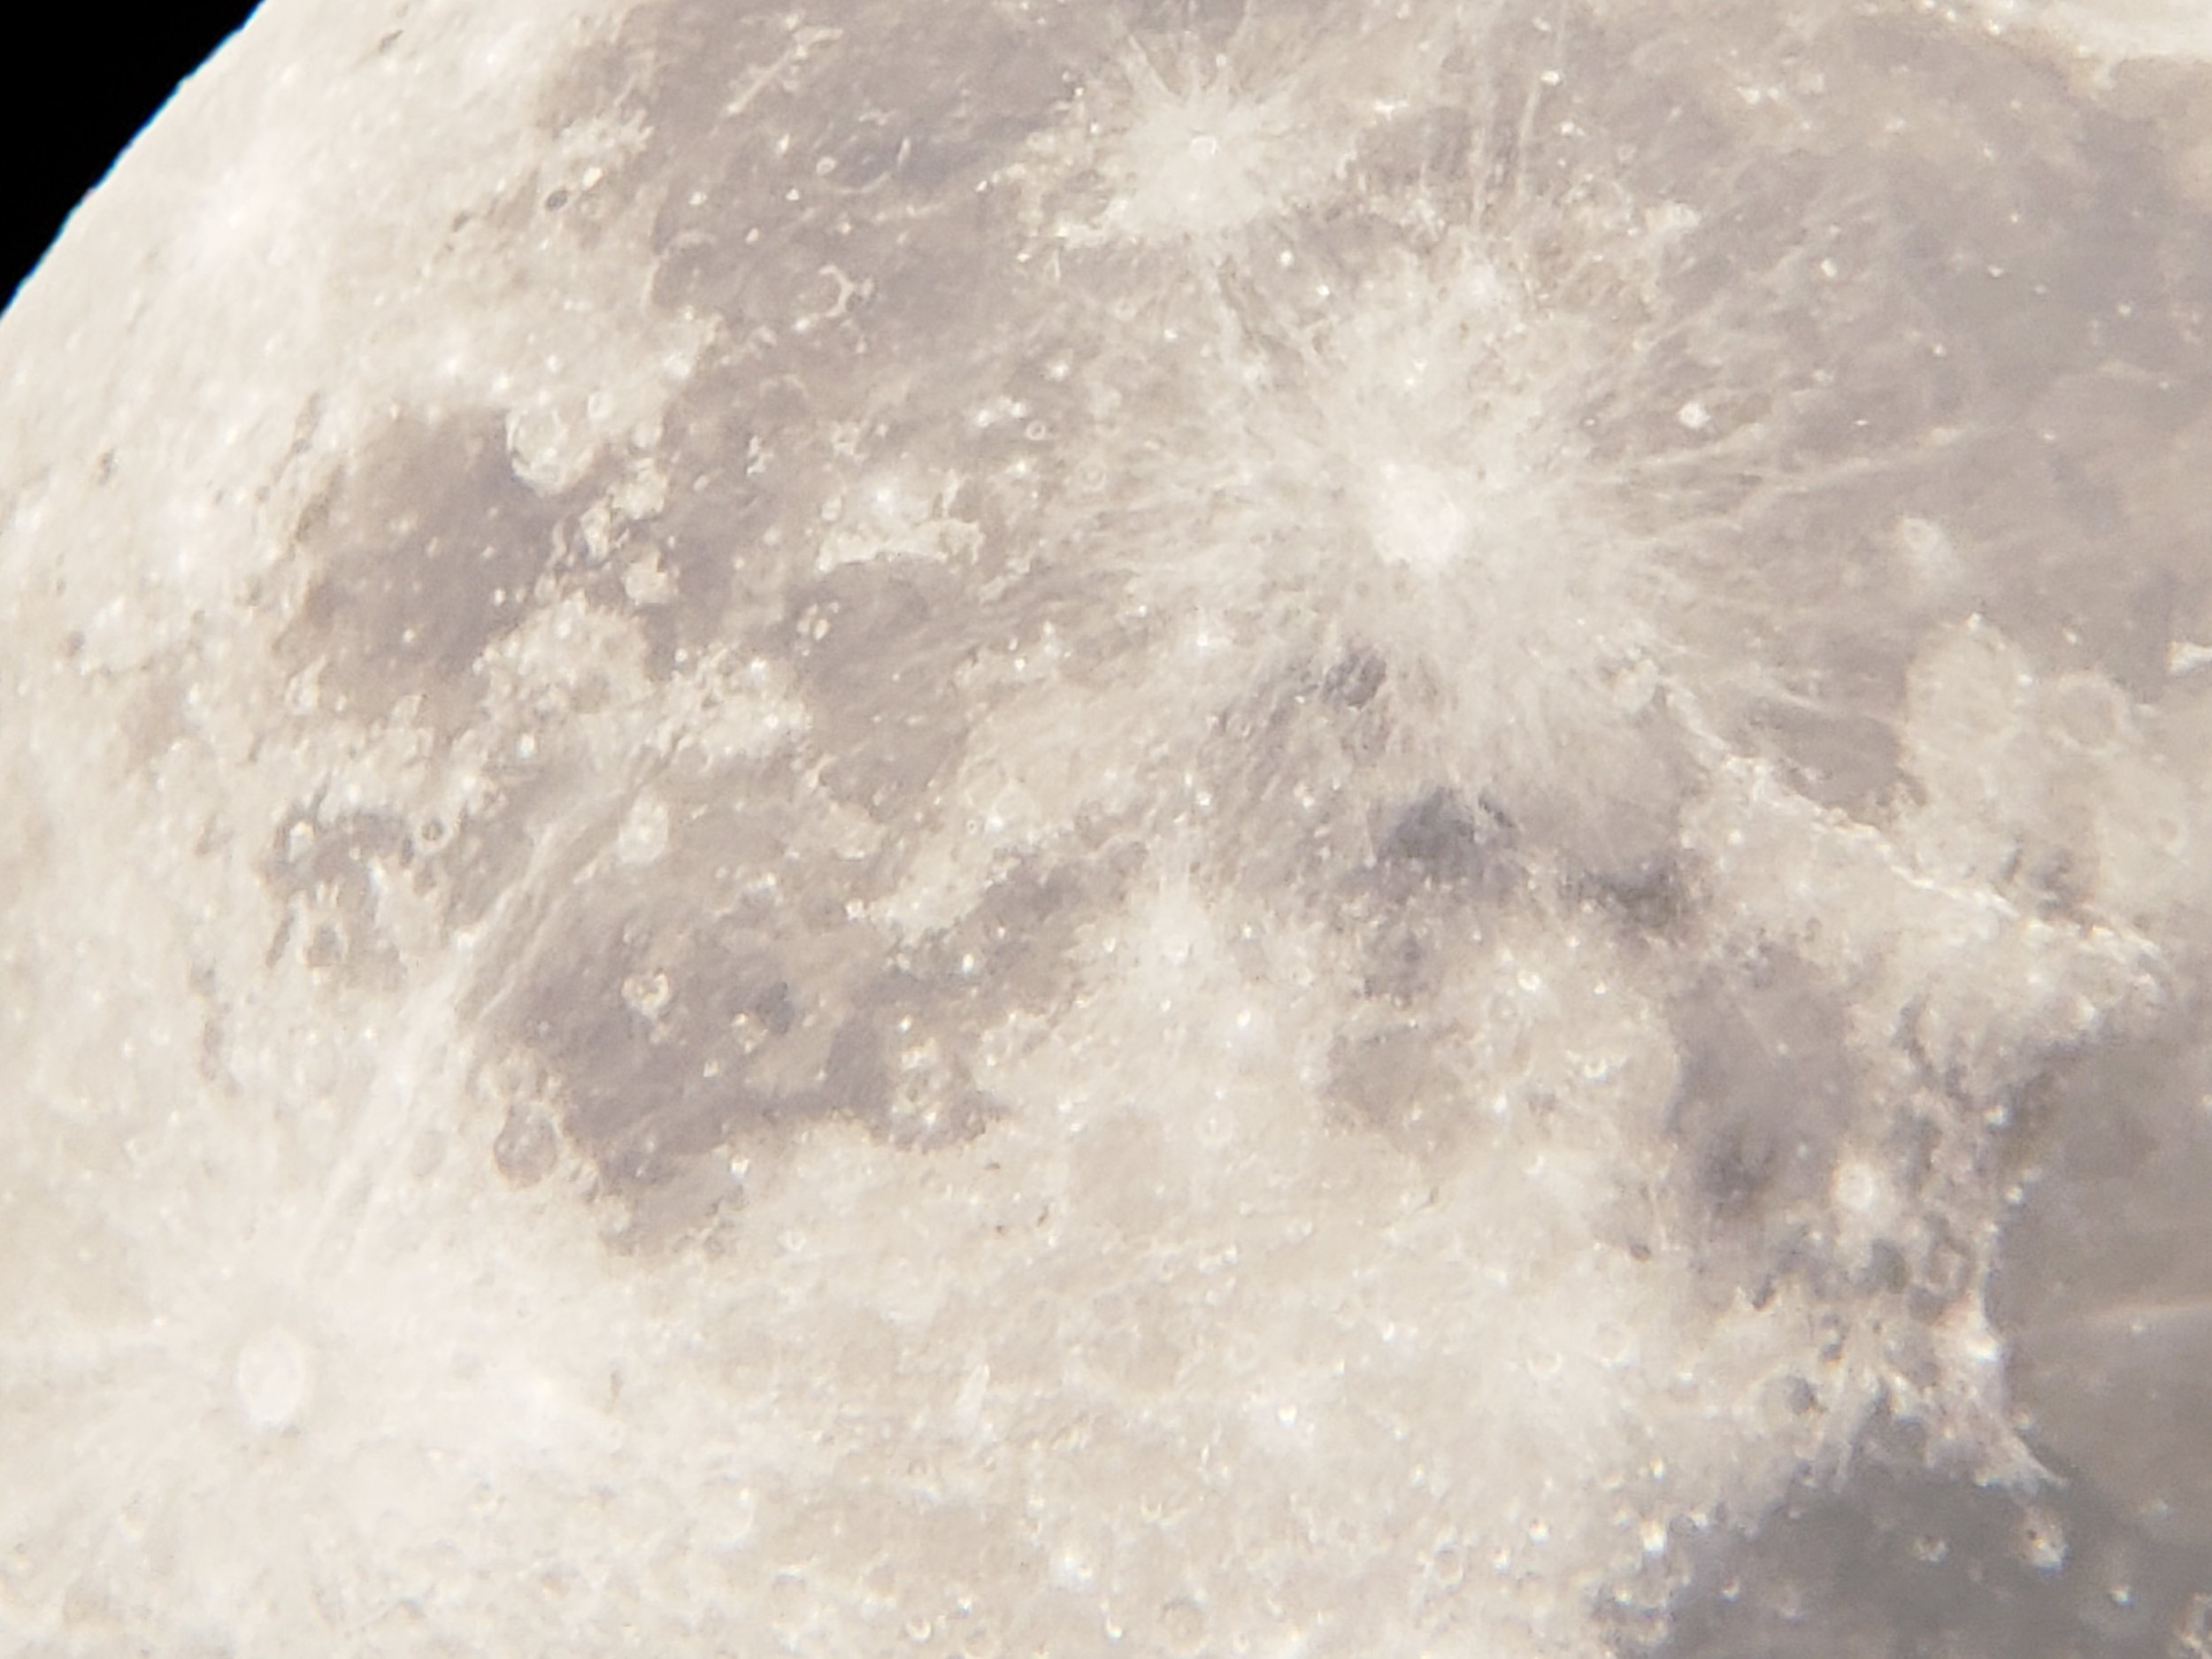 Moon 6.jpeg